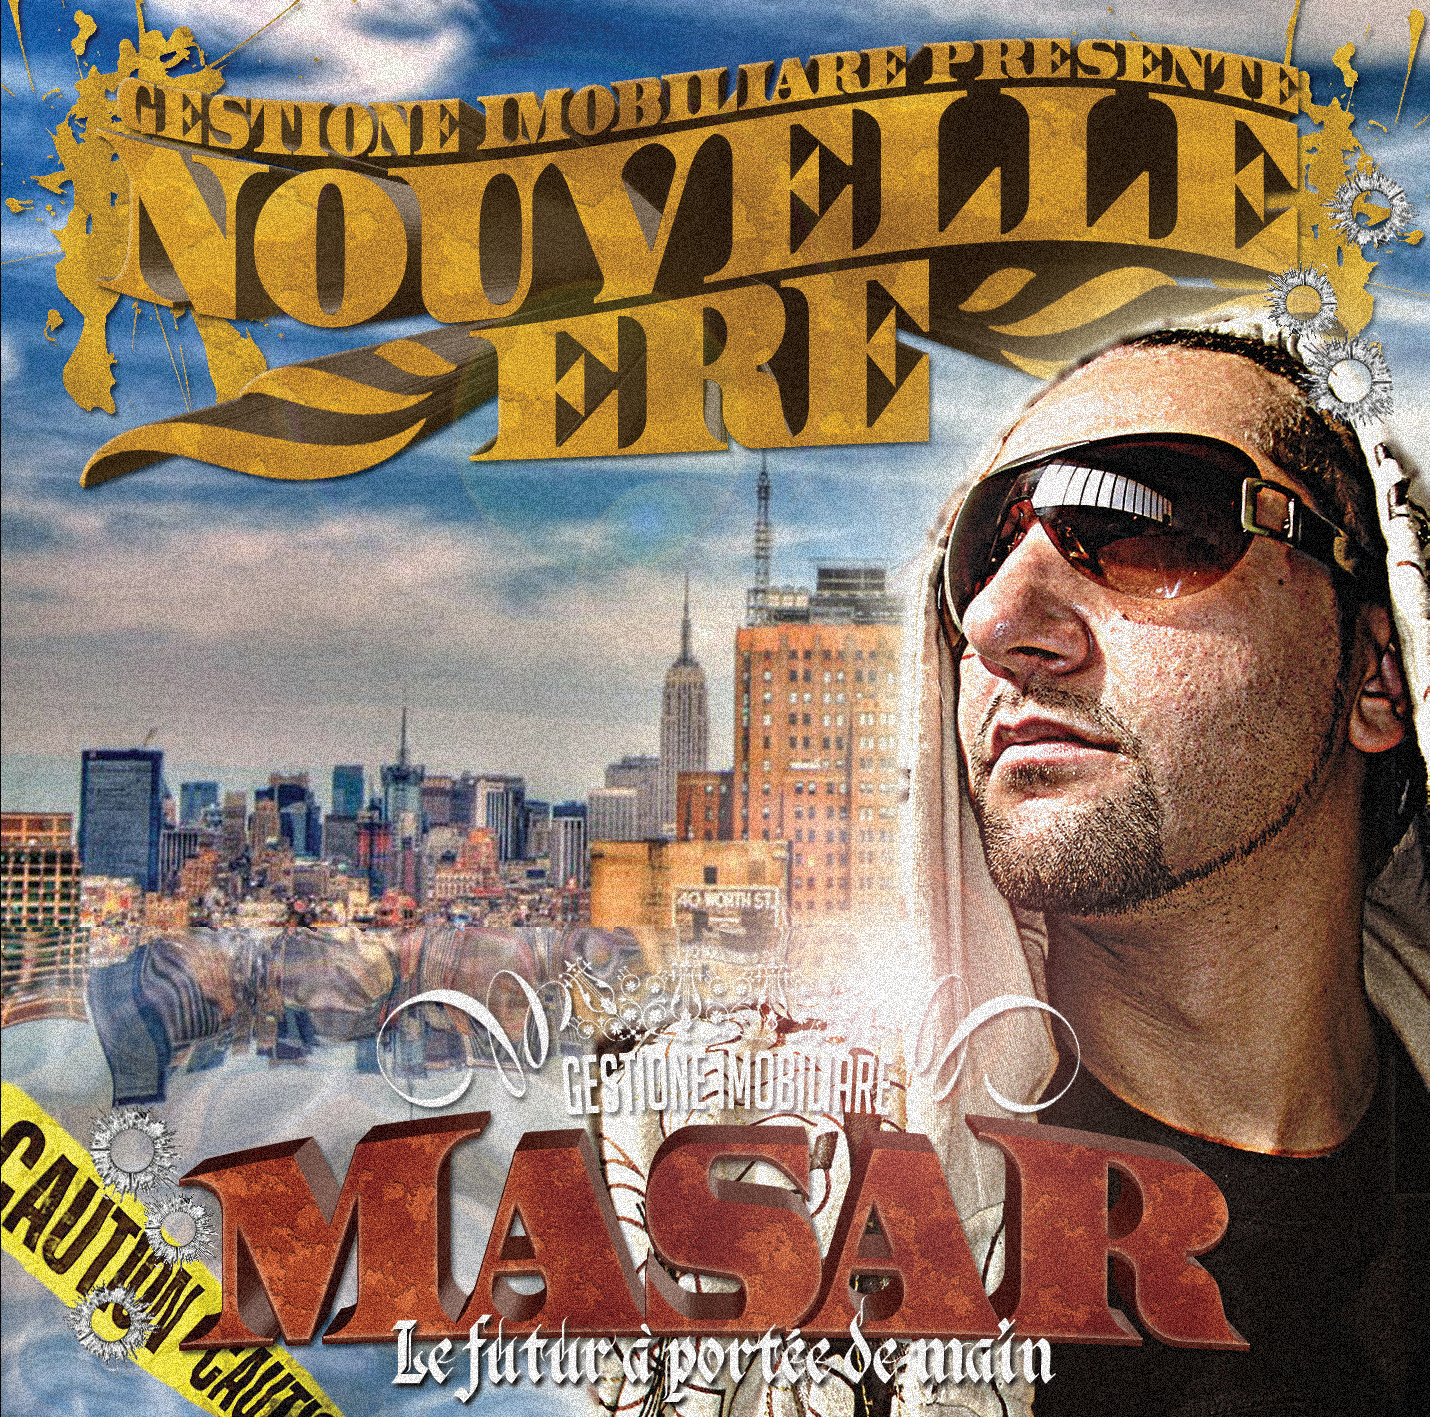 Masar-Nouvelle-ere---Album-Cover